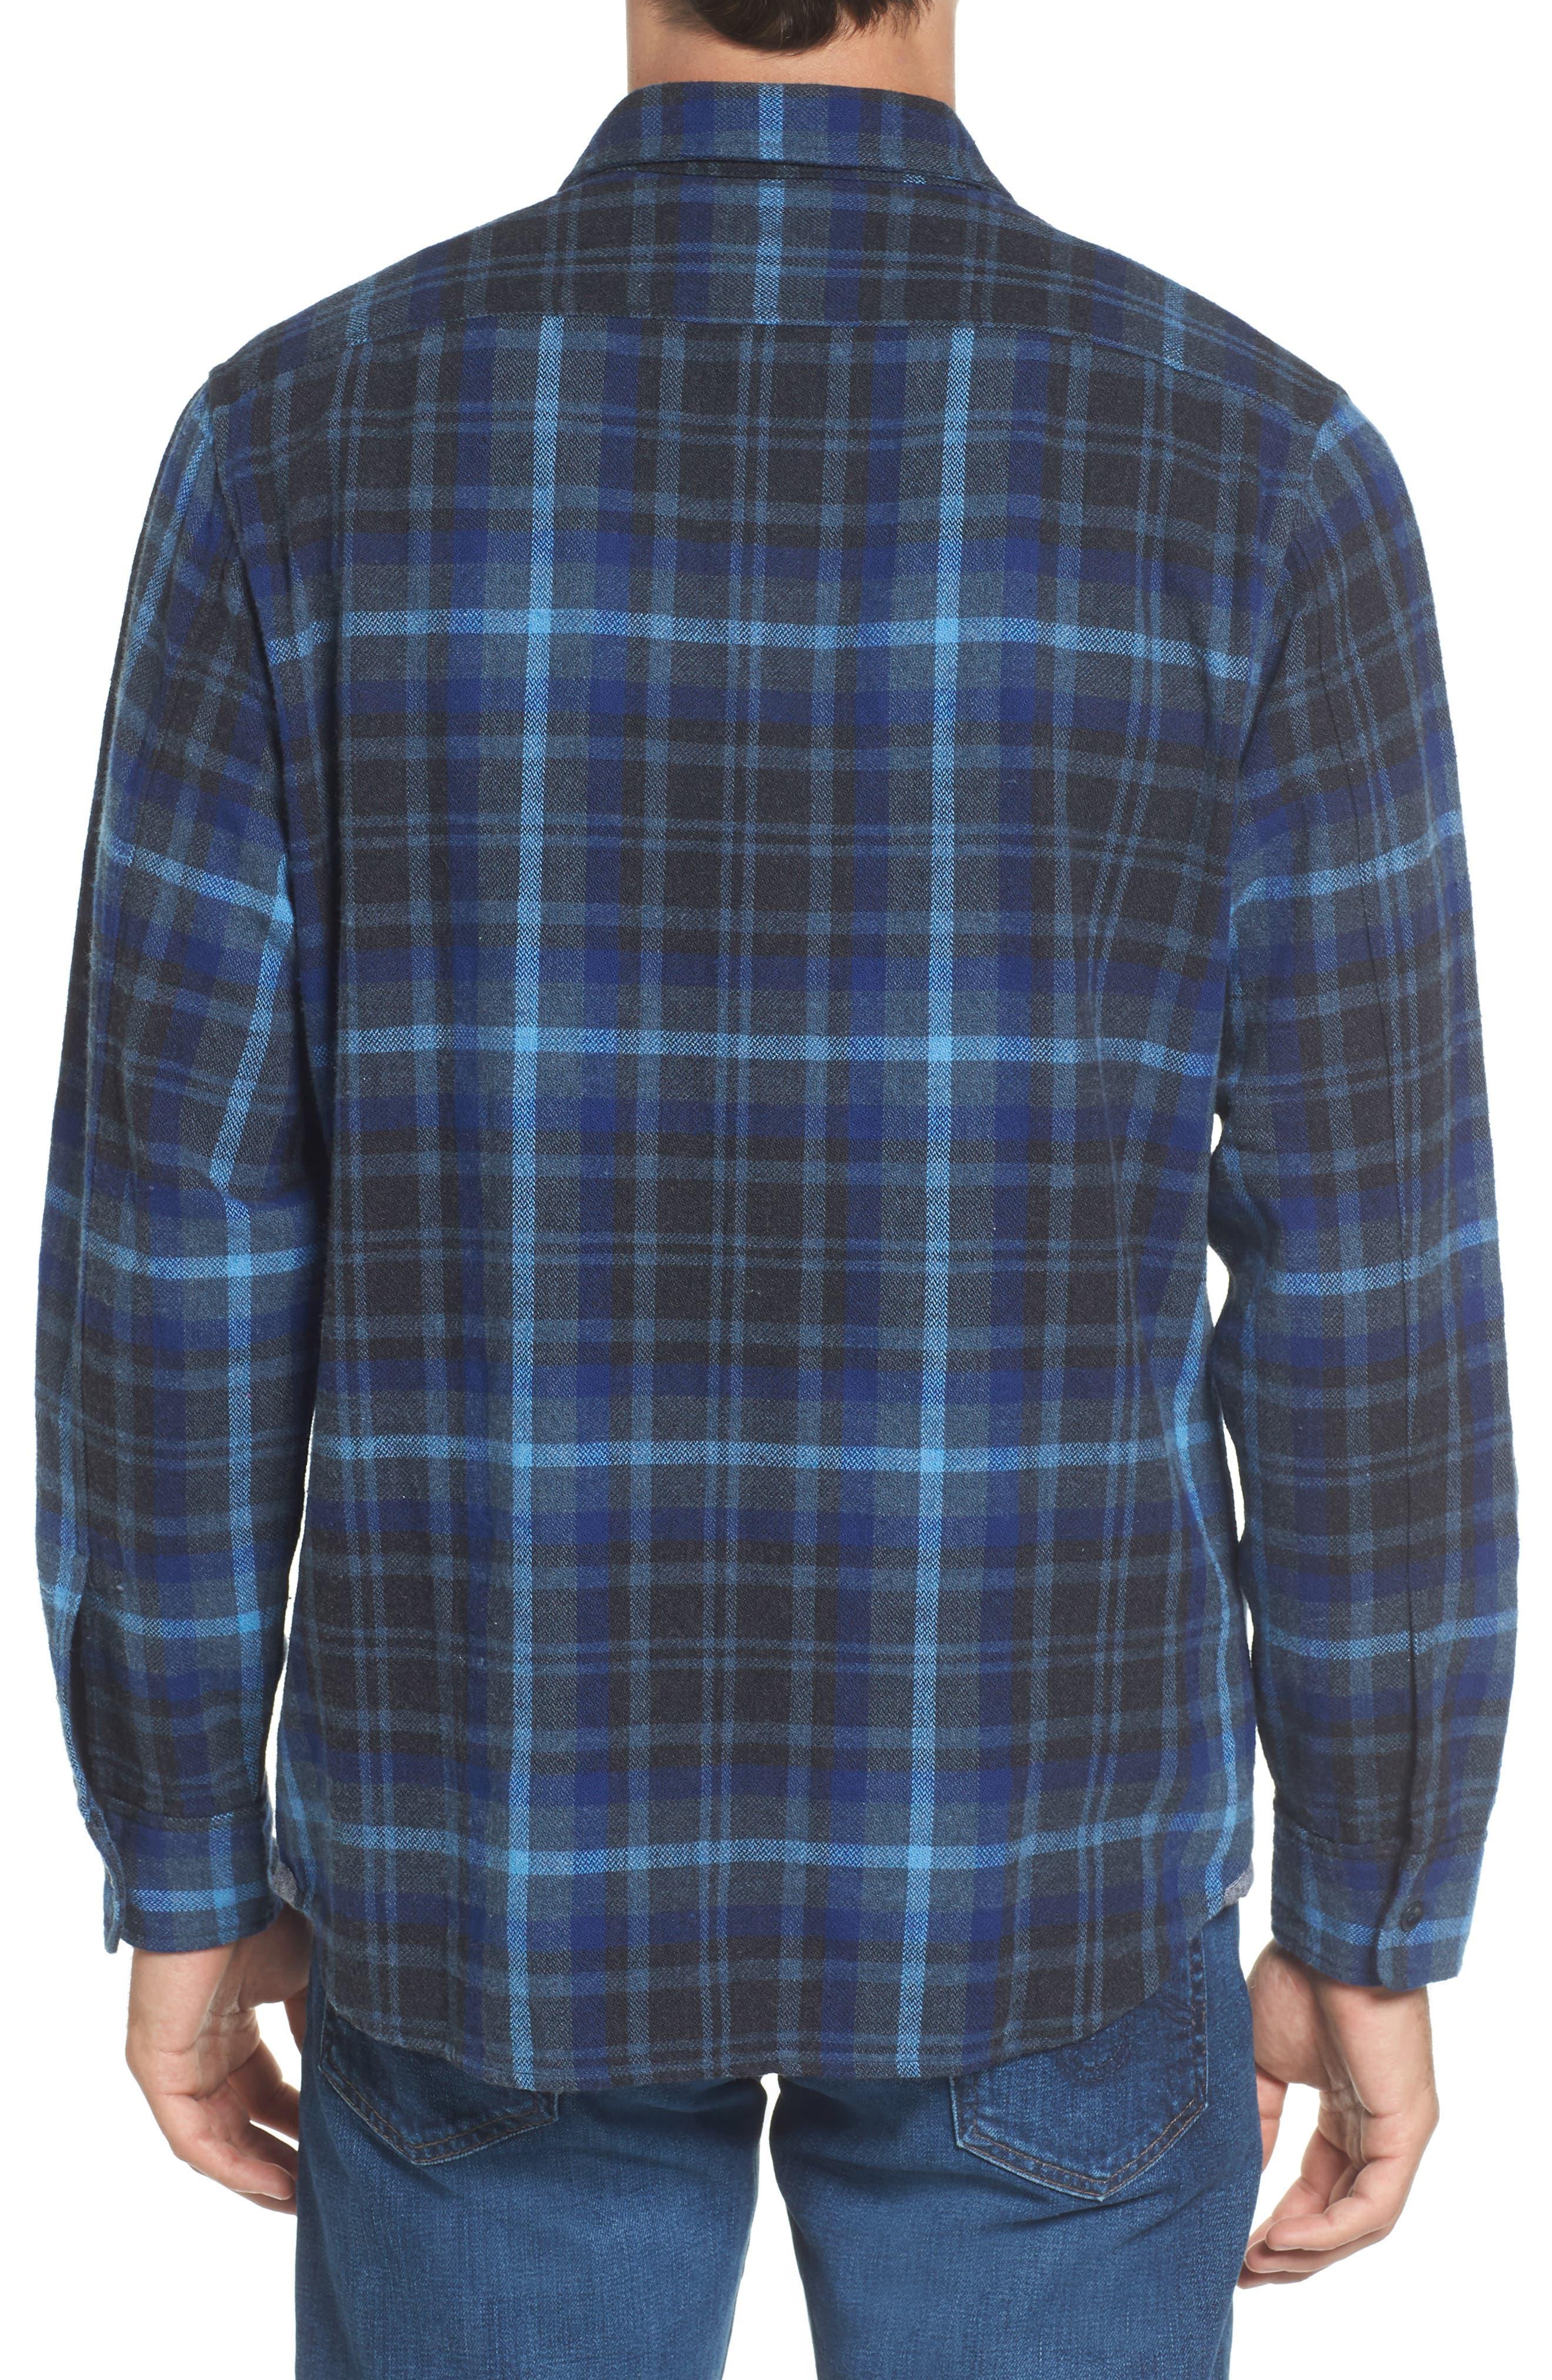 Barton Modern Fit Plaid Flannel Sport Shirt,                             Alternate thumbnail 2, color,                             Charcoal Royal Gray